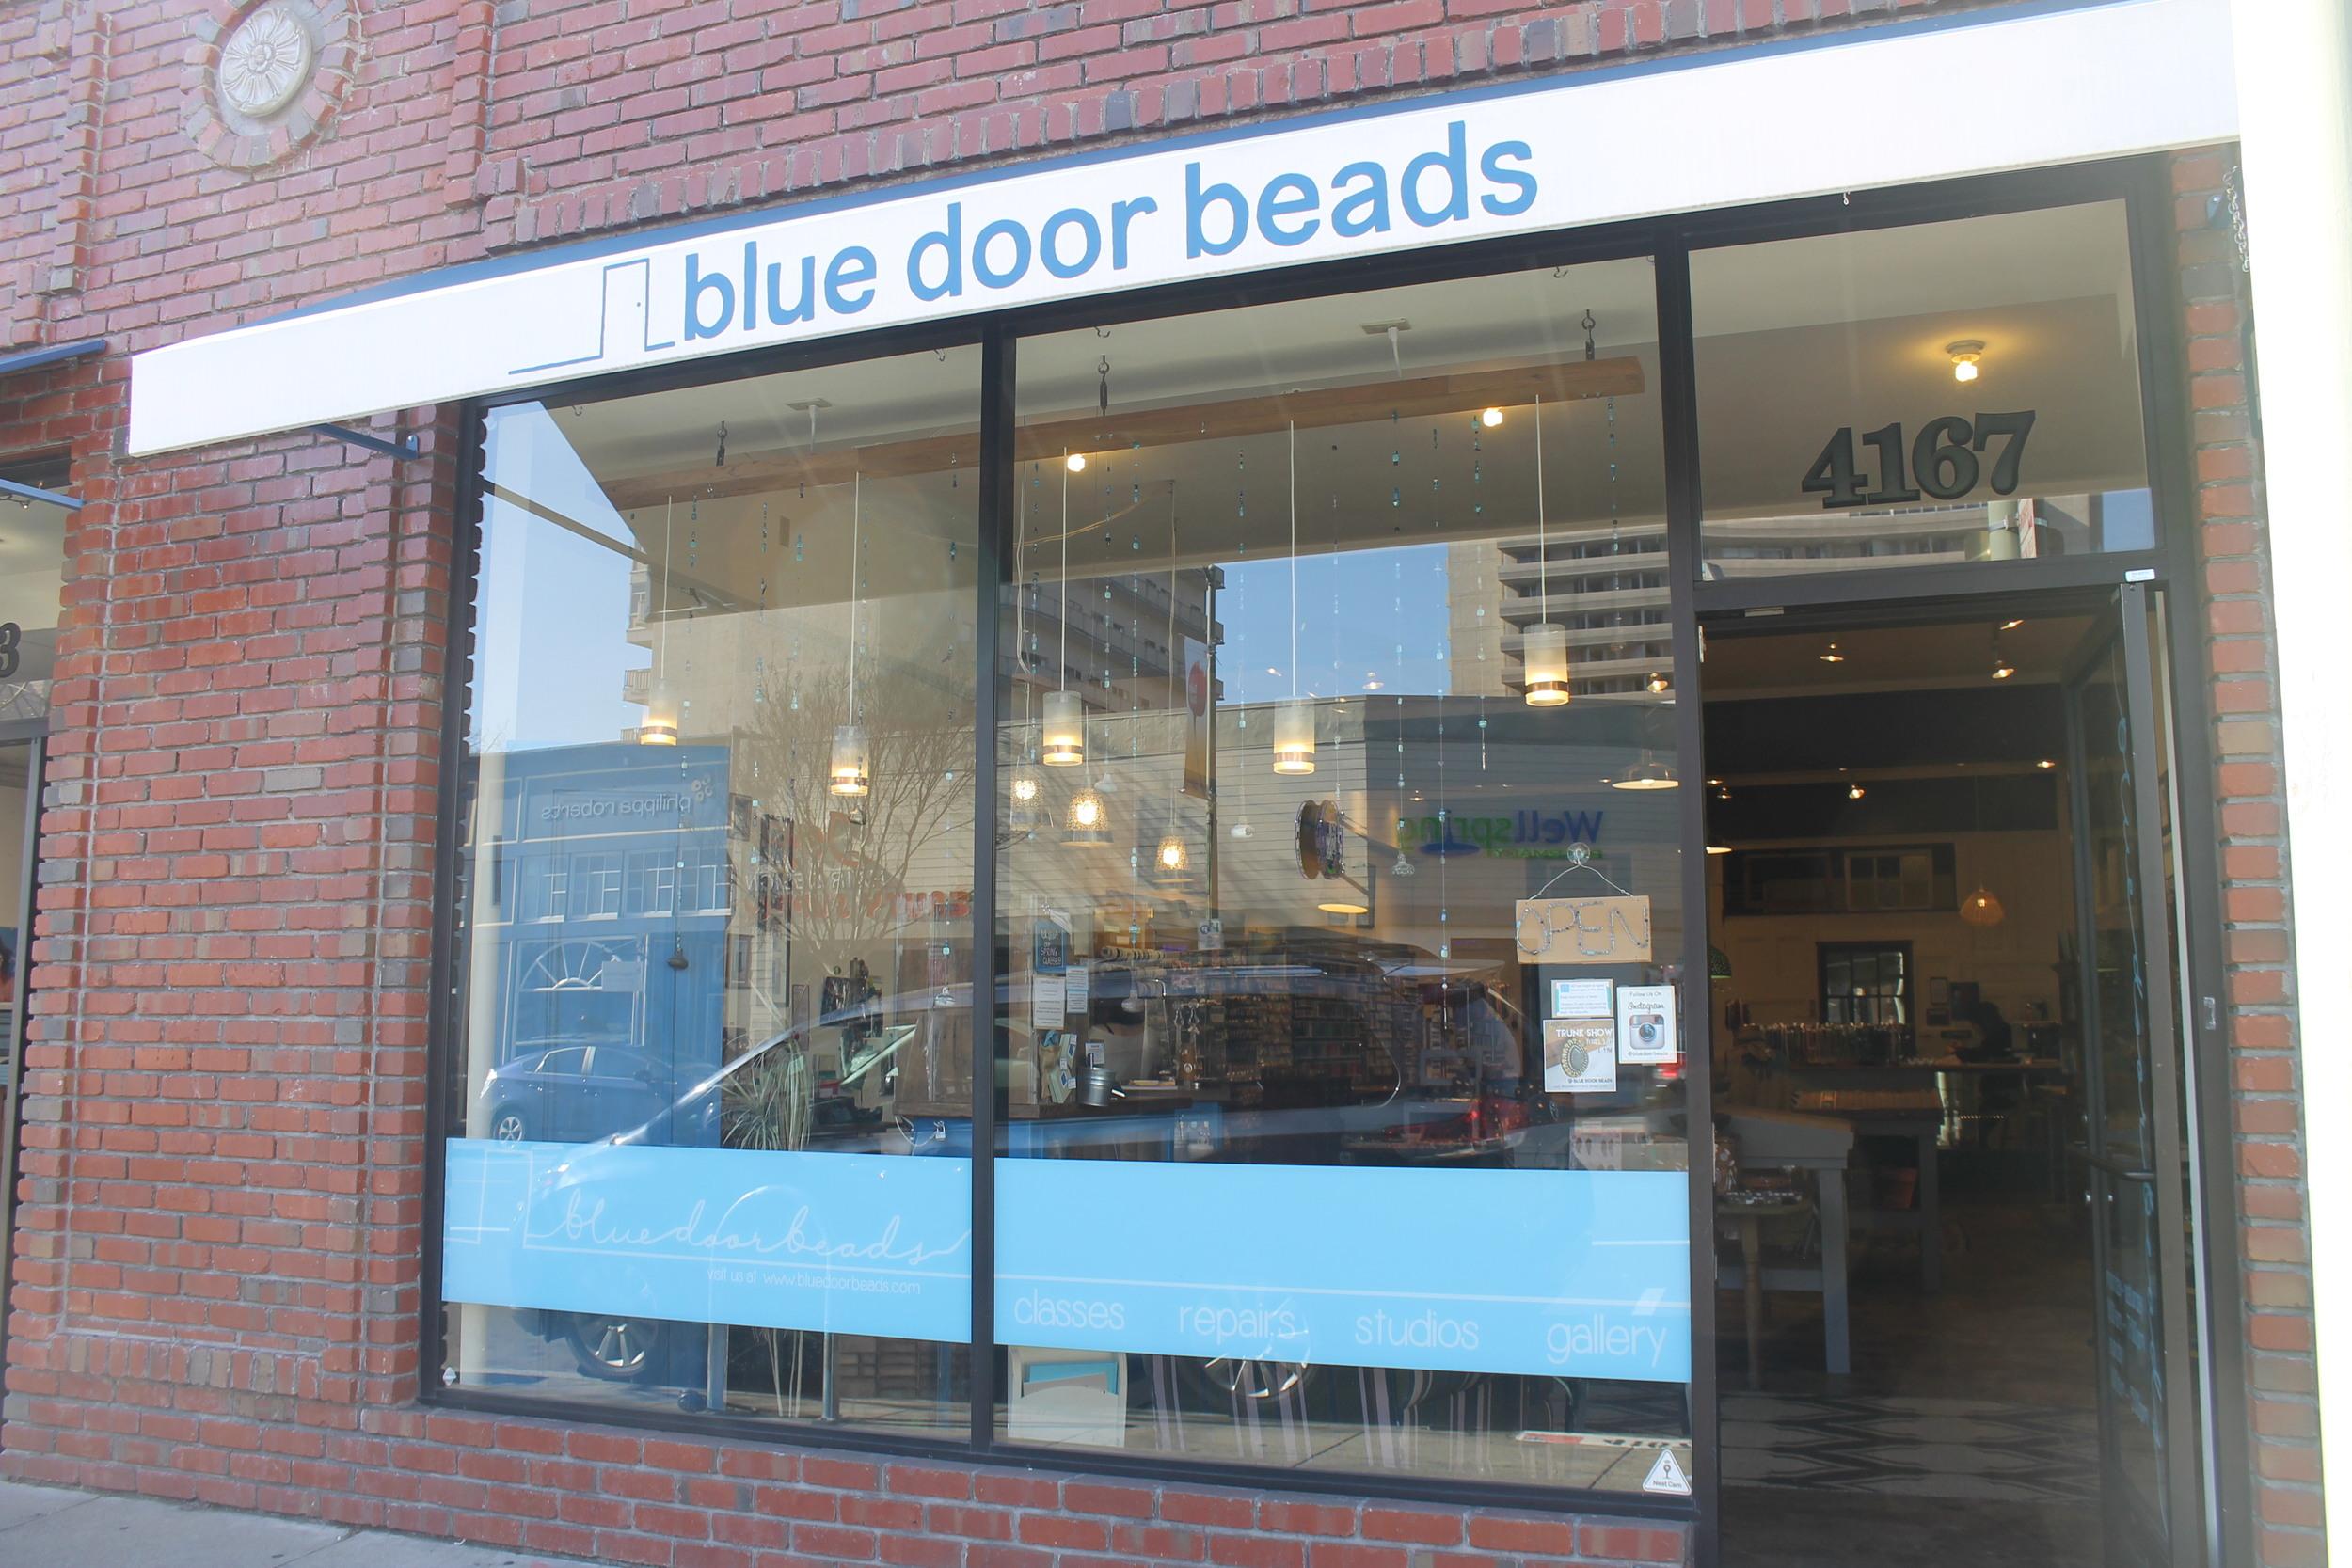 Blue Door Beads shop entrance